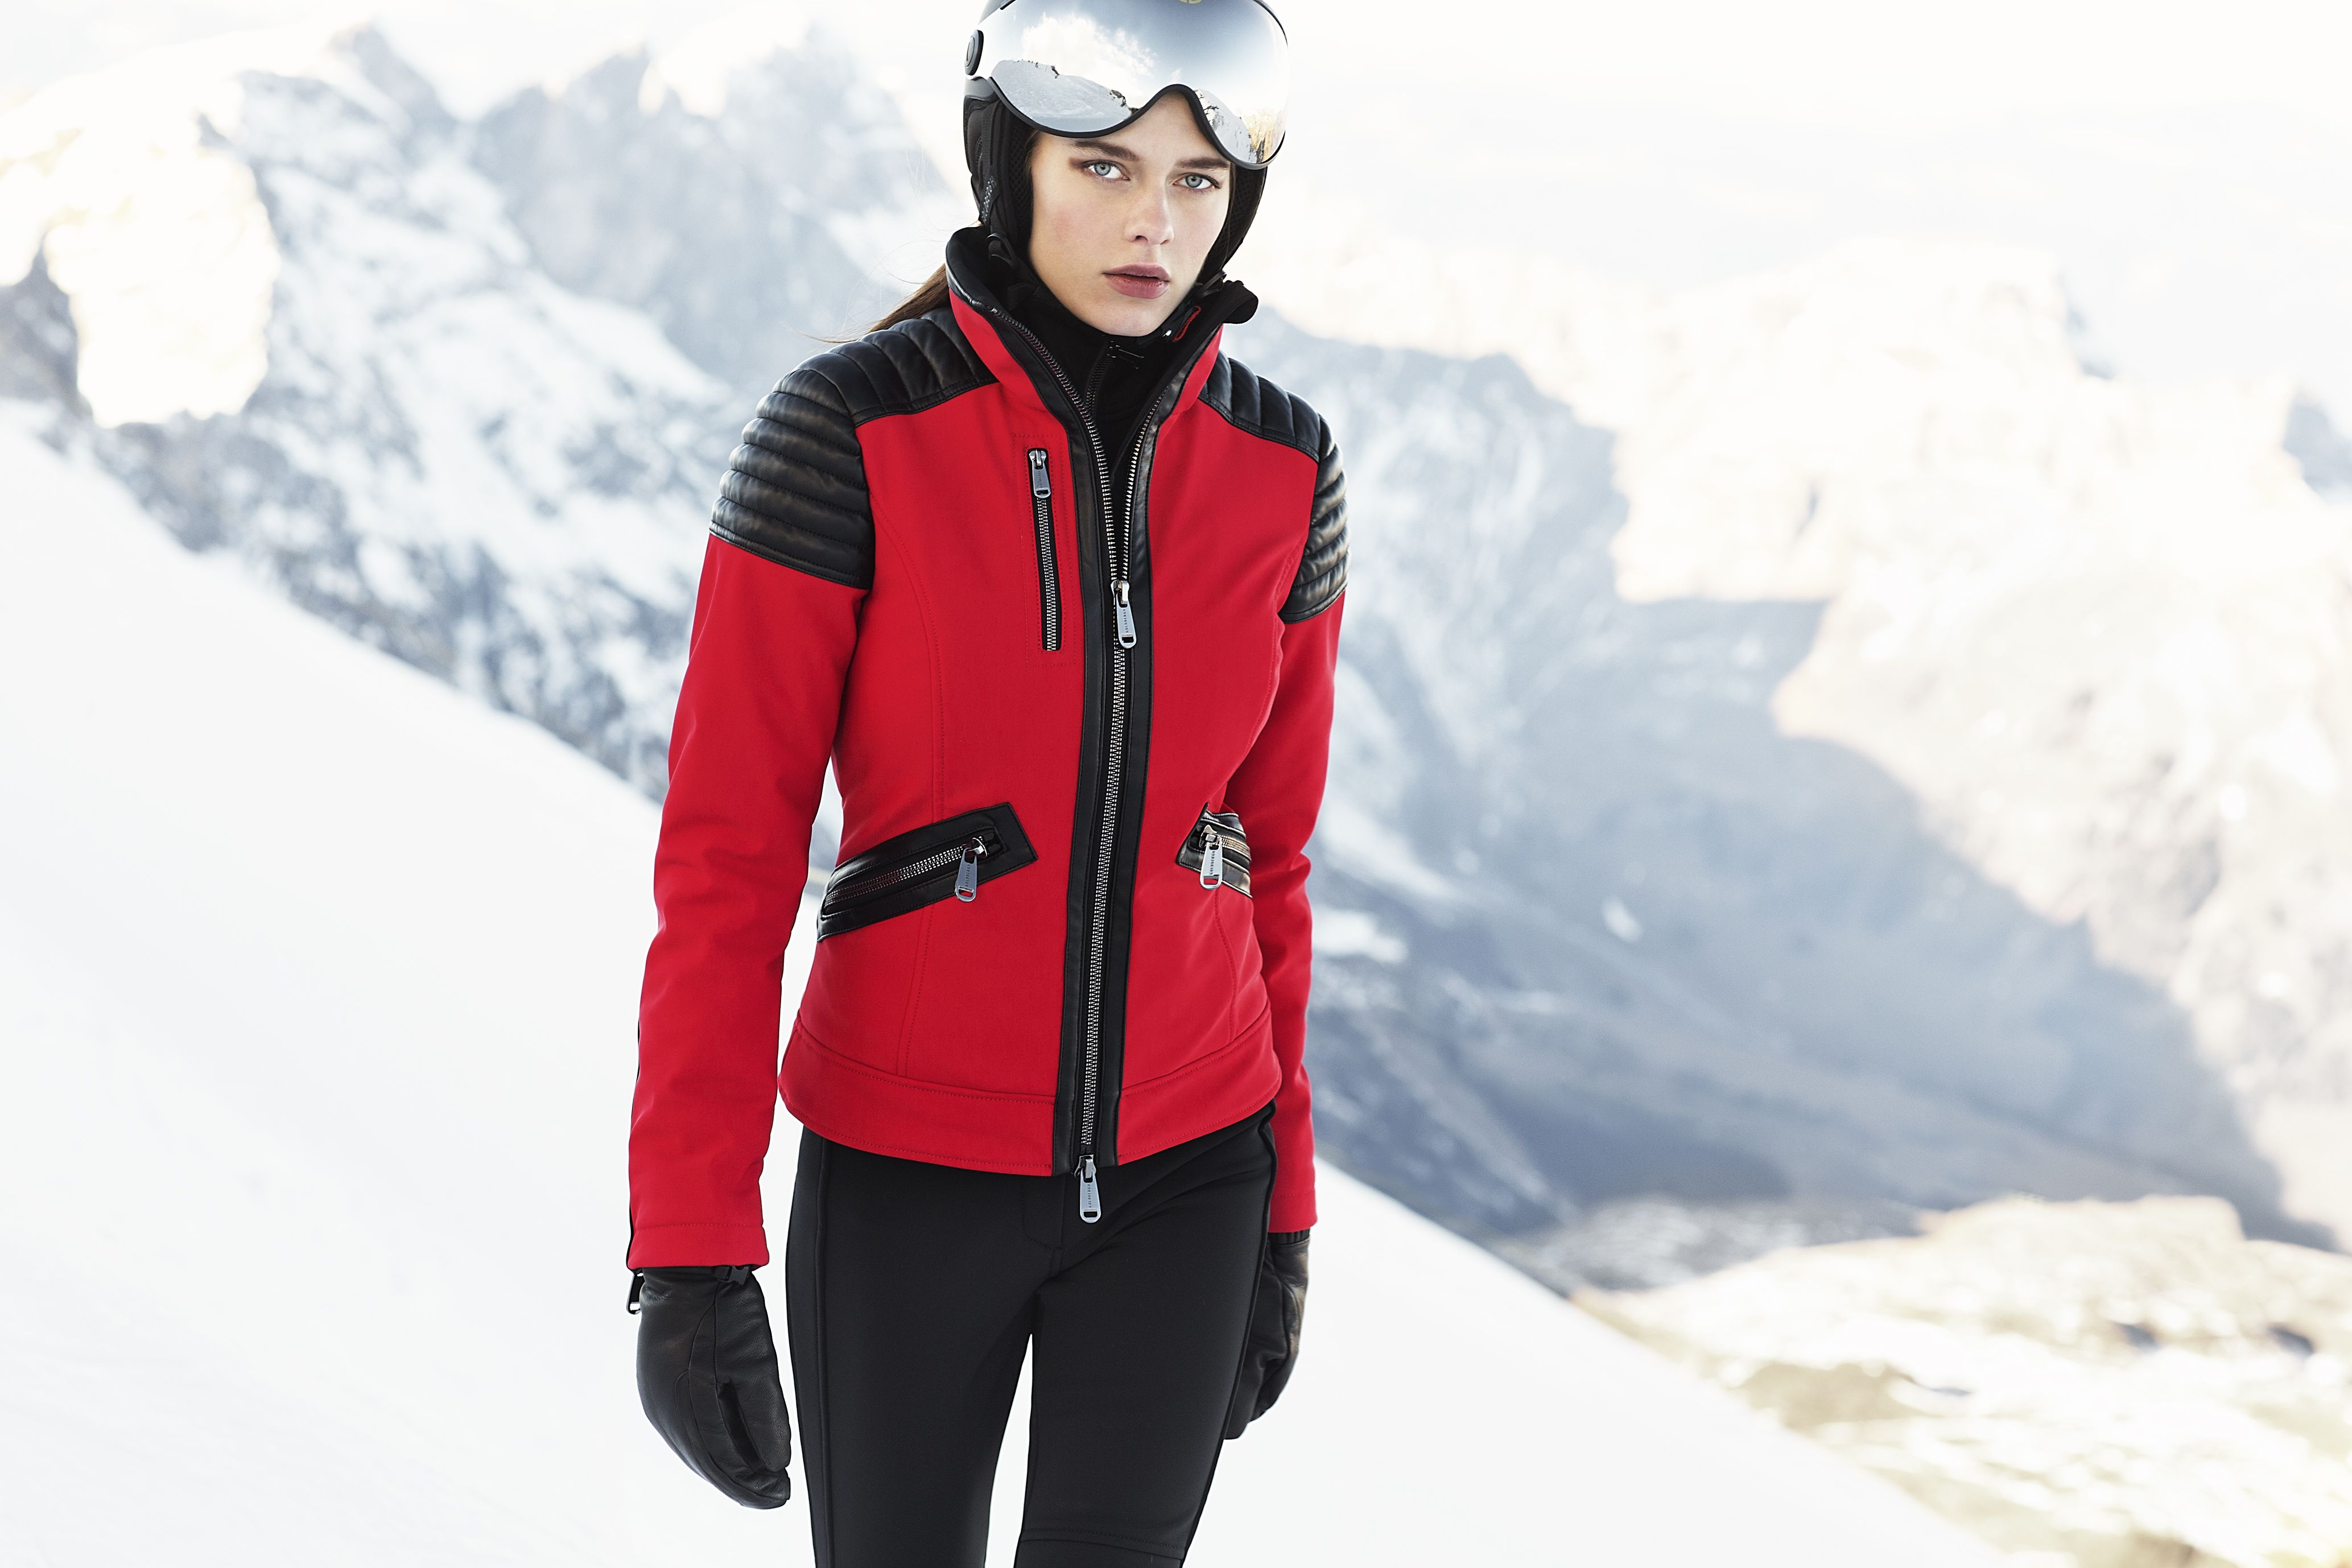 aa7429bab3 Leonie Ski Jacket red. GOLDBERGH Luxury Sports Jacket 2017